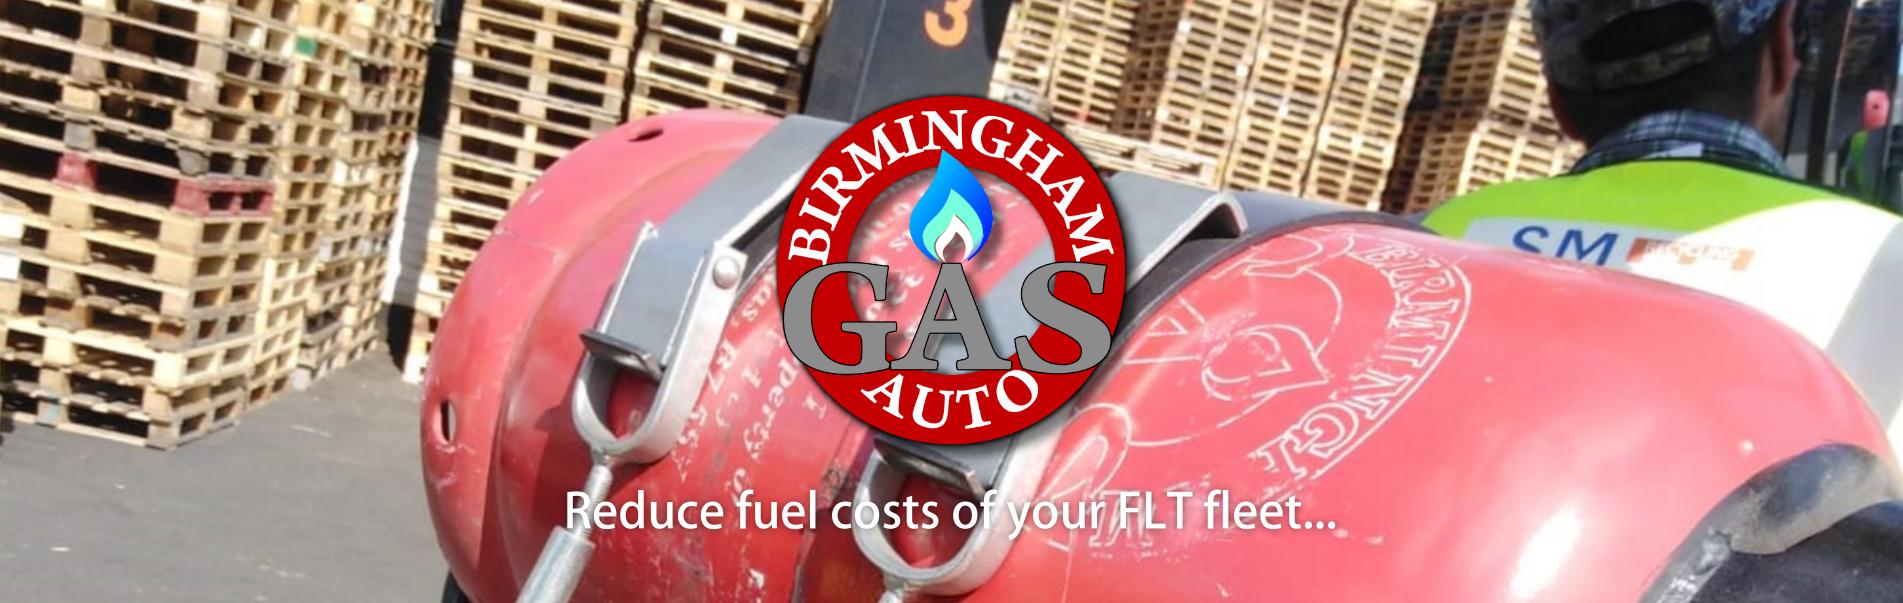 Birmingham Autogas